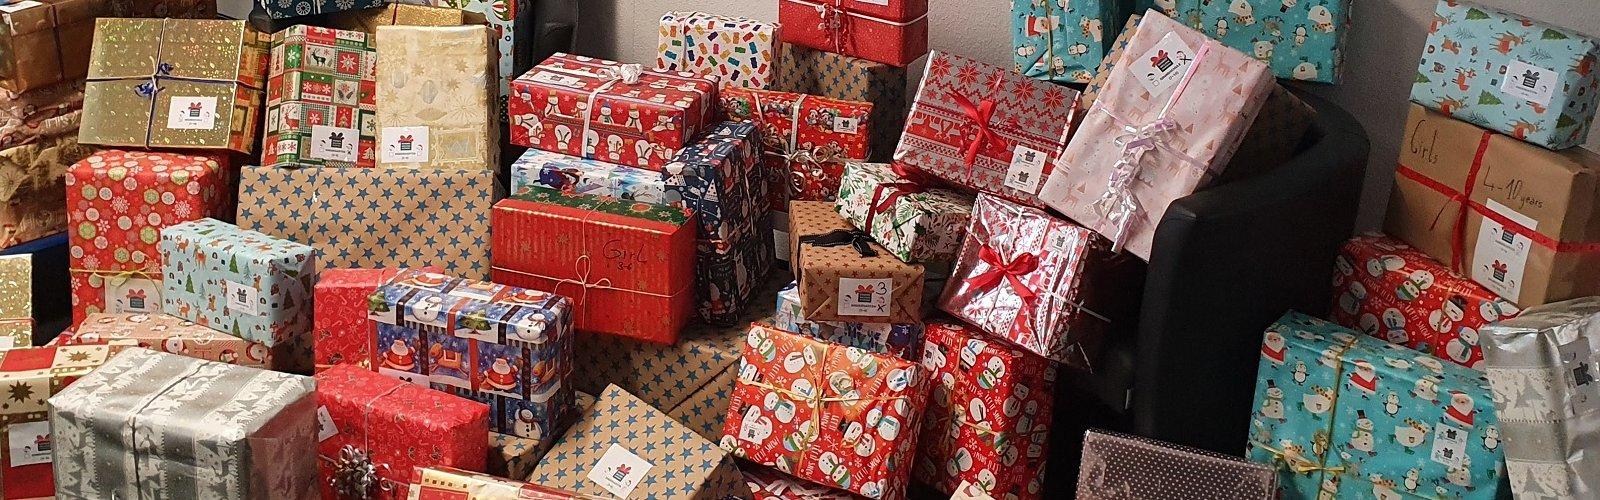 csm_christmas_convoy_1_375e547273.jpg